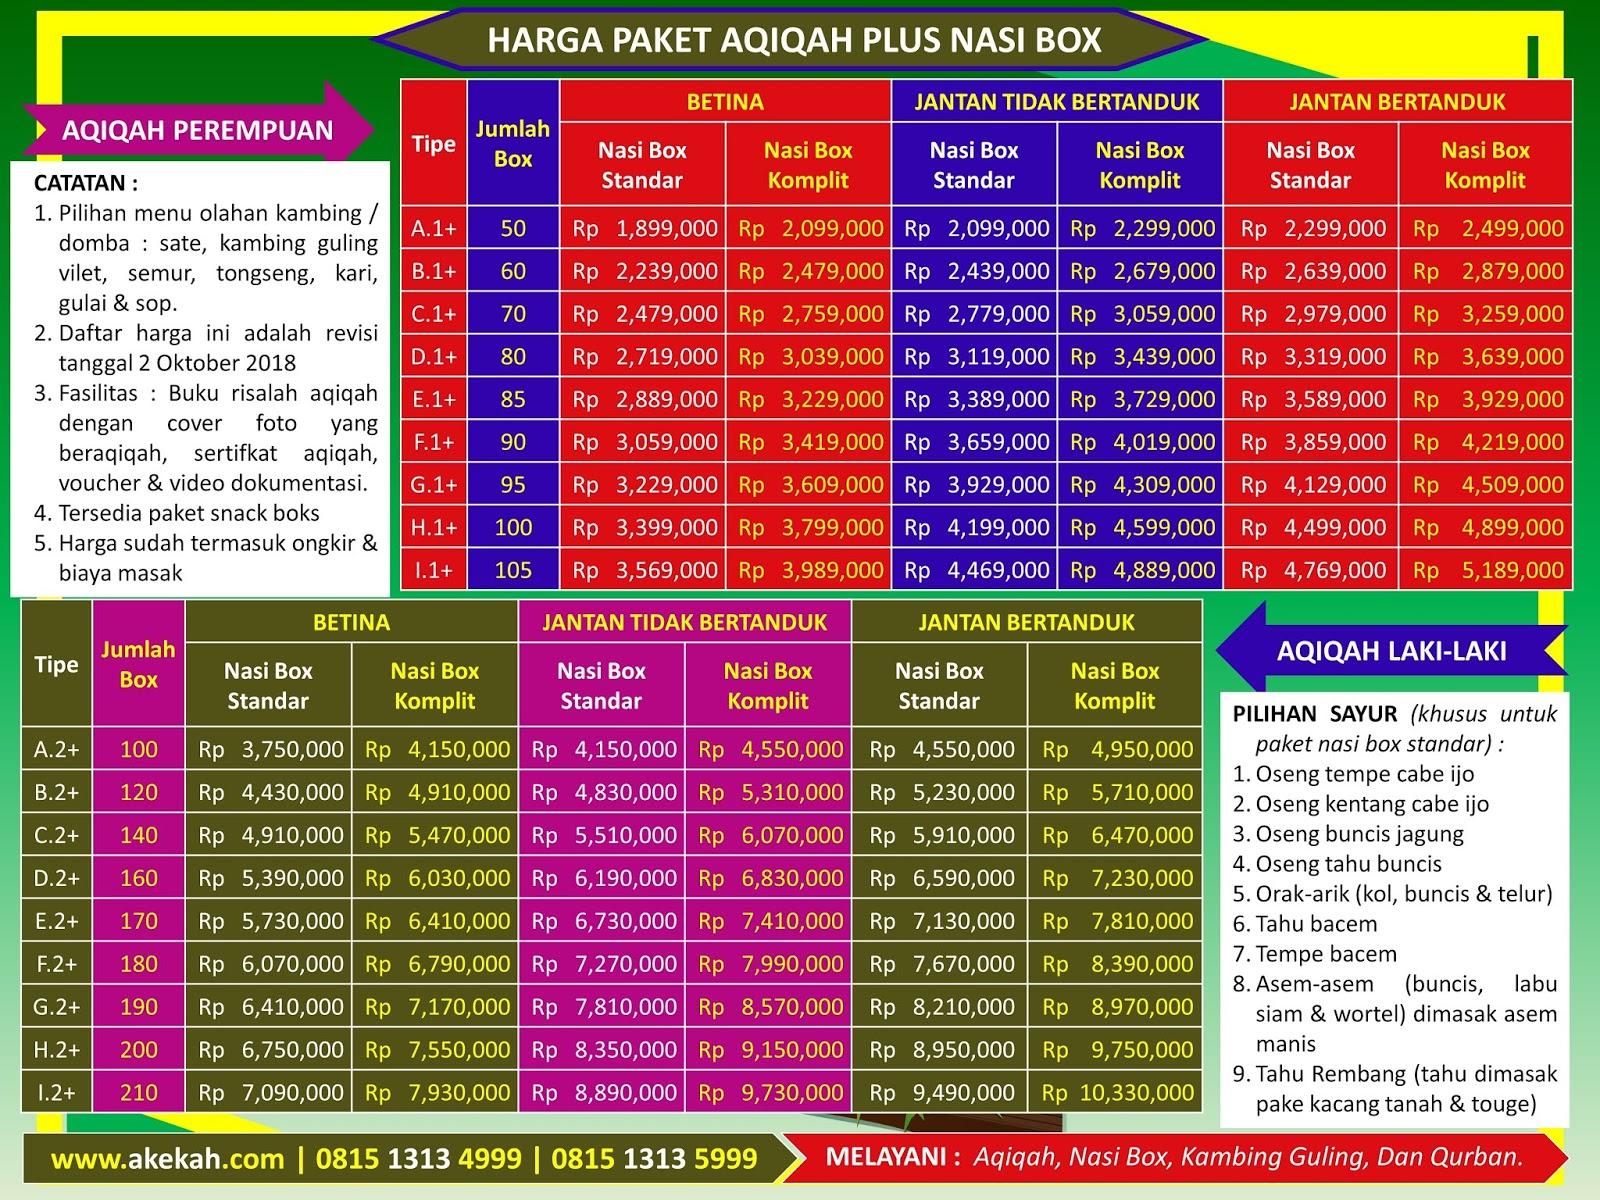 Harga Kambing Akikah Dan Catering Plus Untuk Laki-Laki Wilayah Kecamatan Cariu Bogor